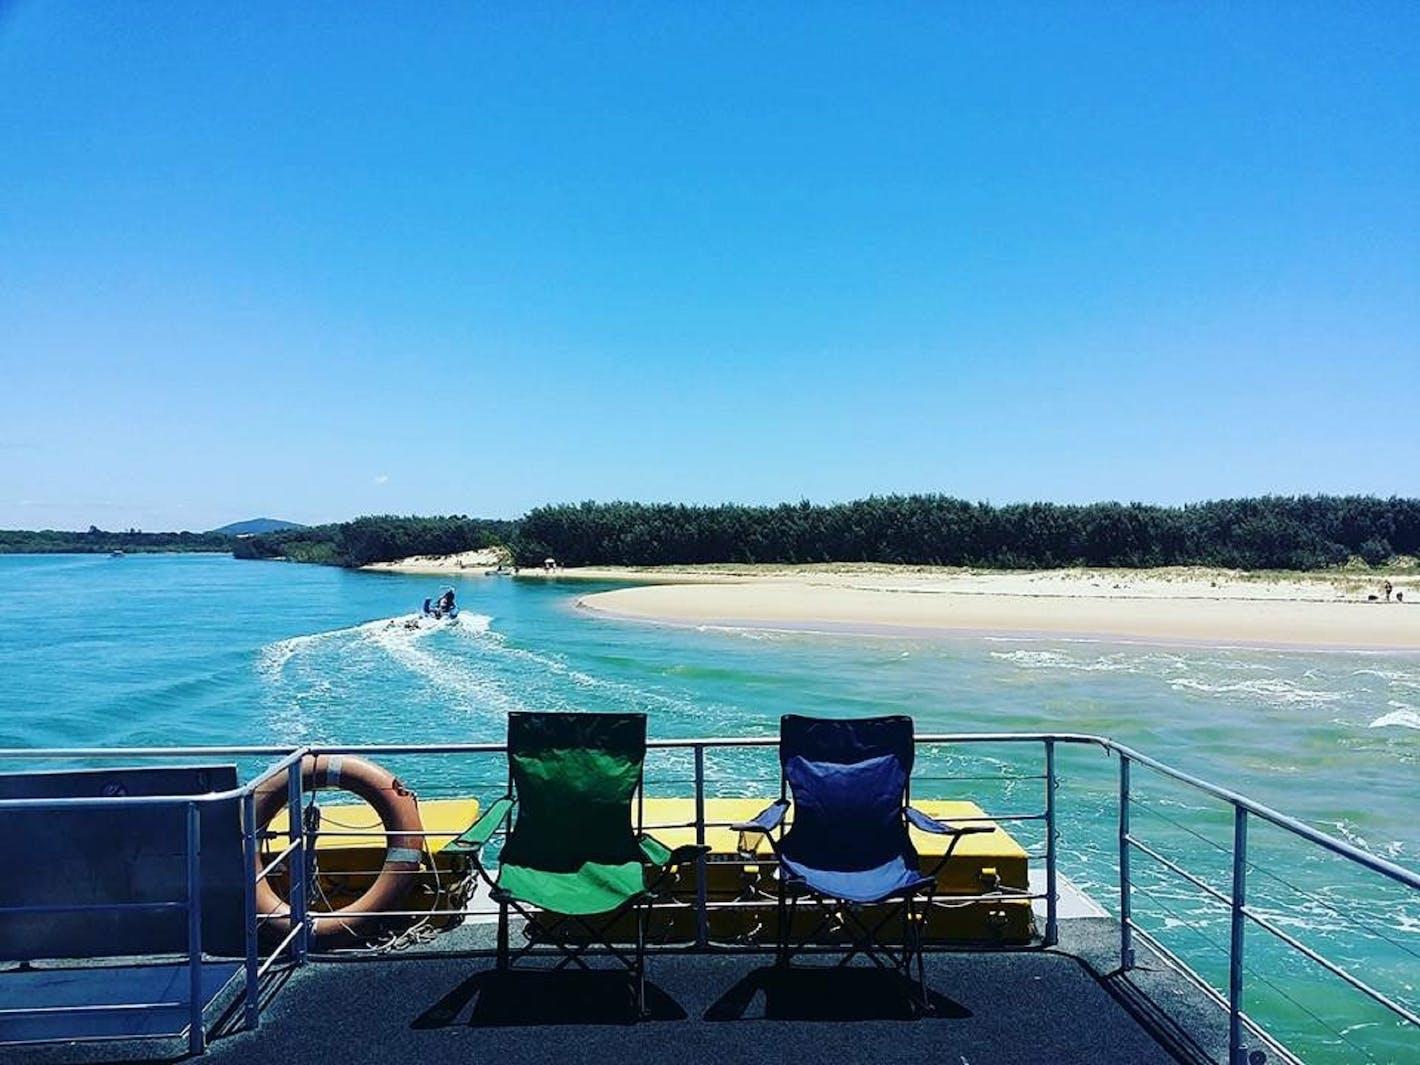 Cruise Maroochy ECO Tour